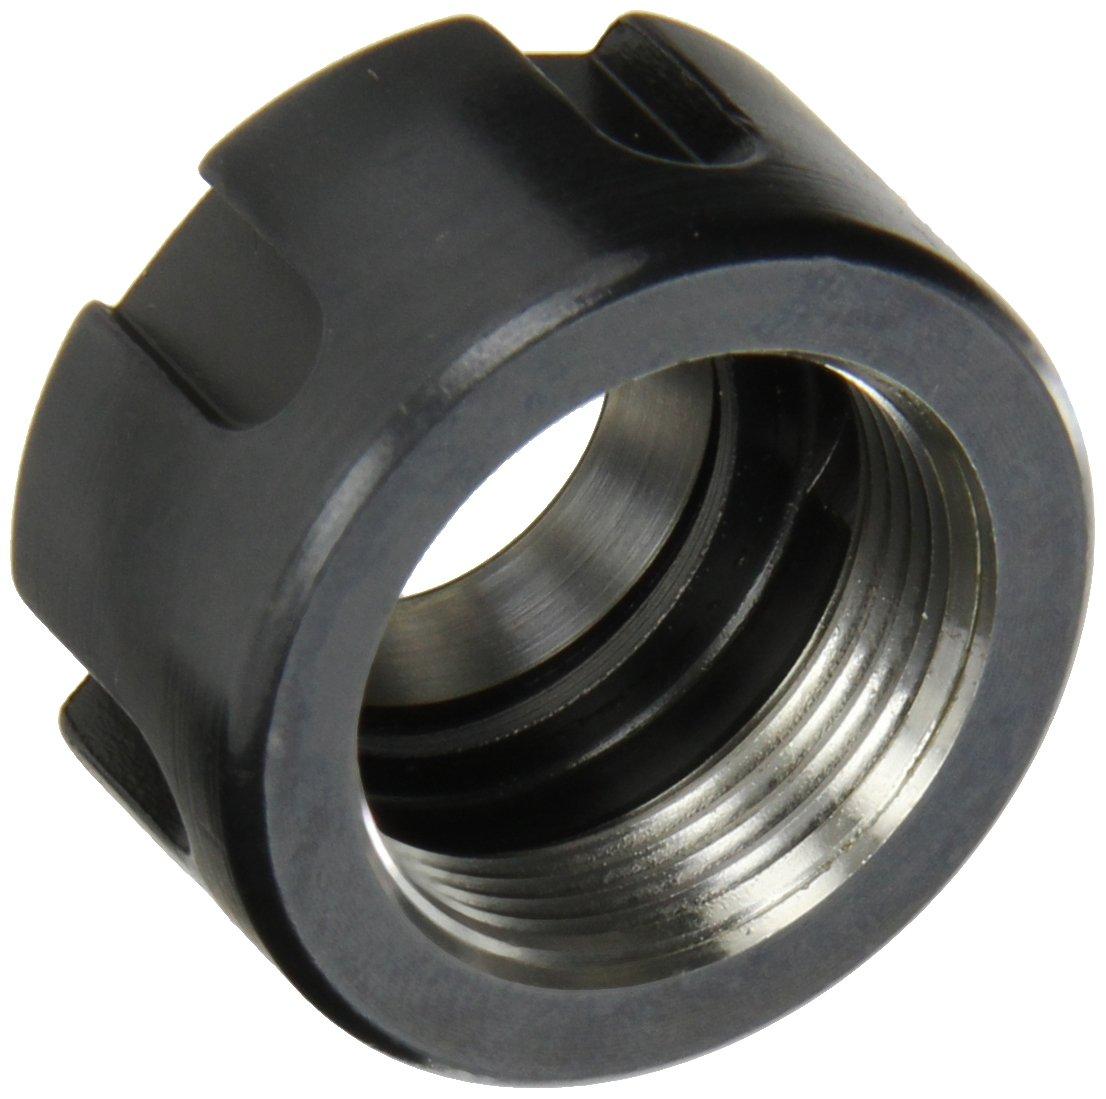 Dorian Tool ER20NTS35 Standard Nut for ER20 Ultra Precision Collets, M25 x 1.5 Thread, 35mm Diameter x 19mm Height